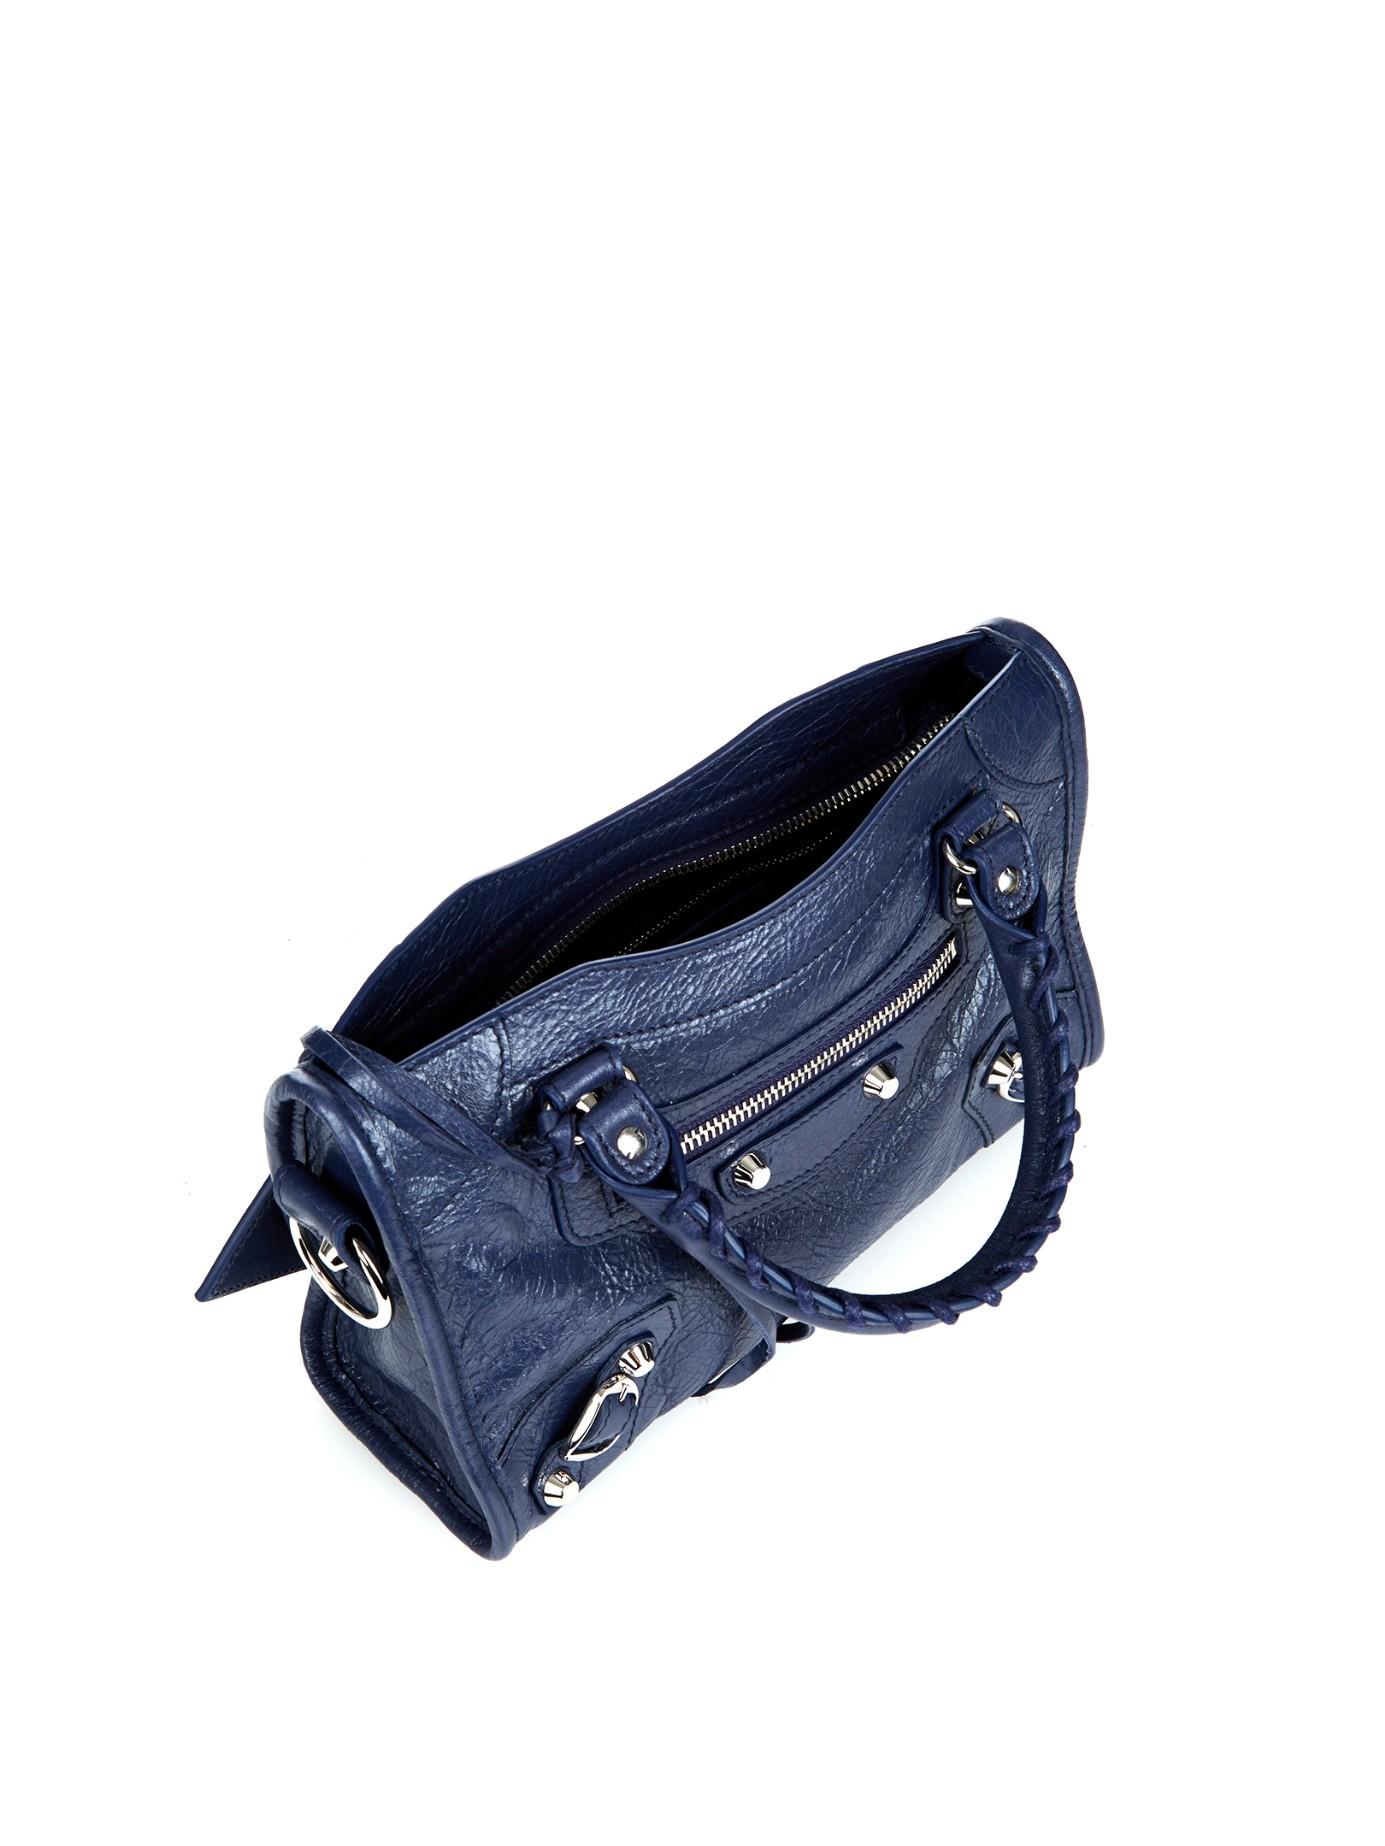 84da34243 Balenciaga Classic Mini City Leather Cross-body Bag in Blue - Lyst